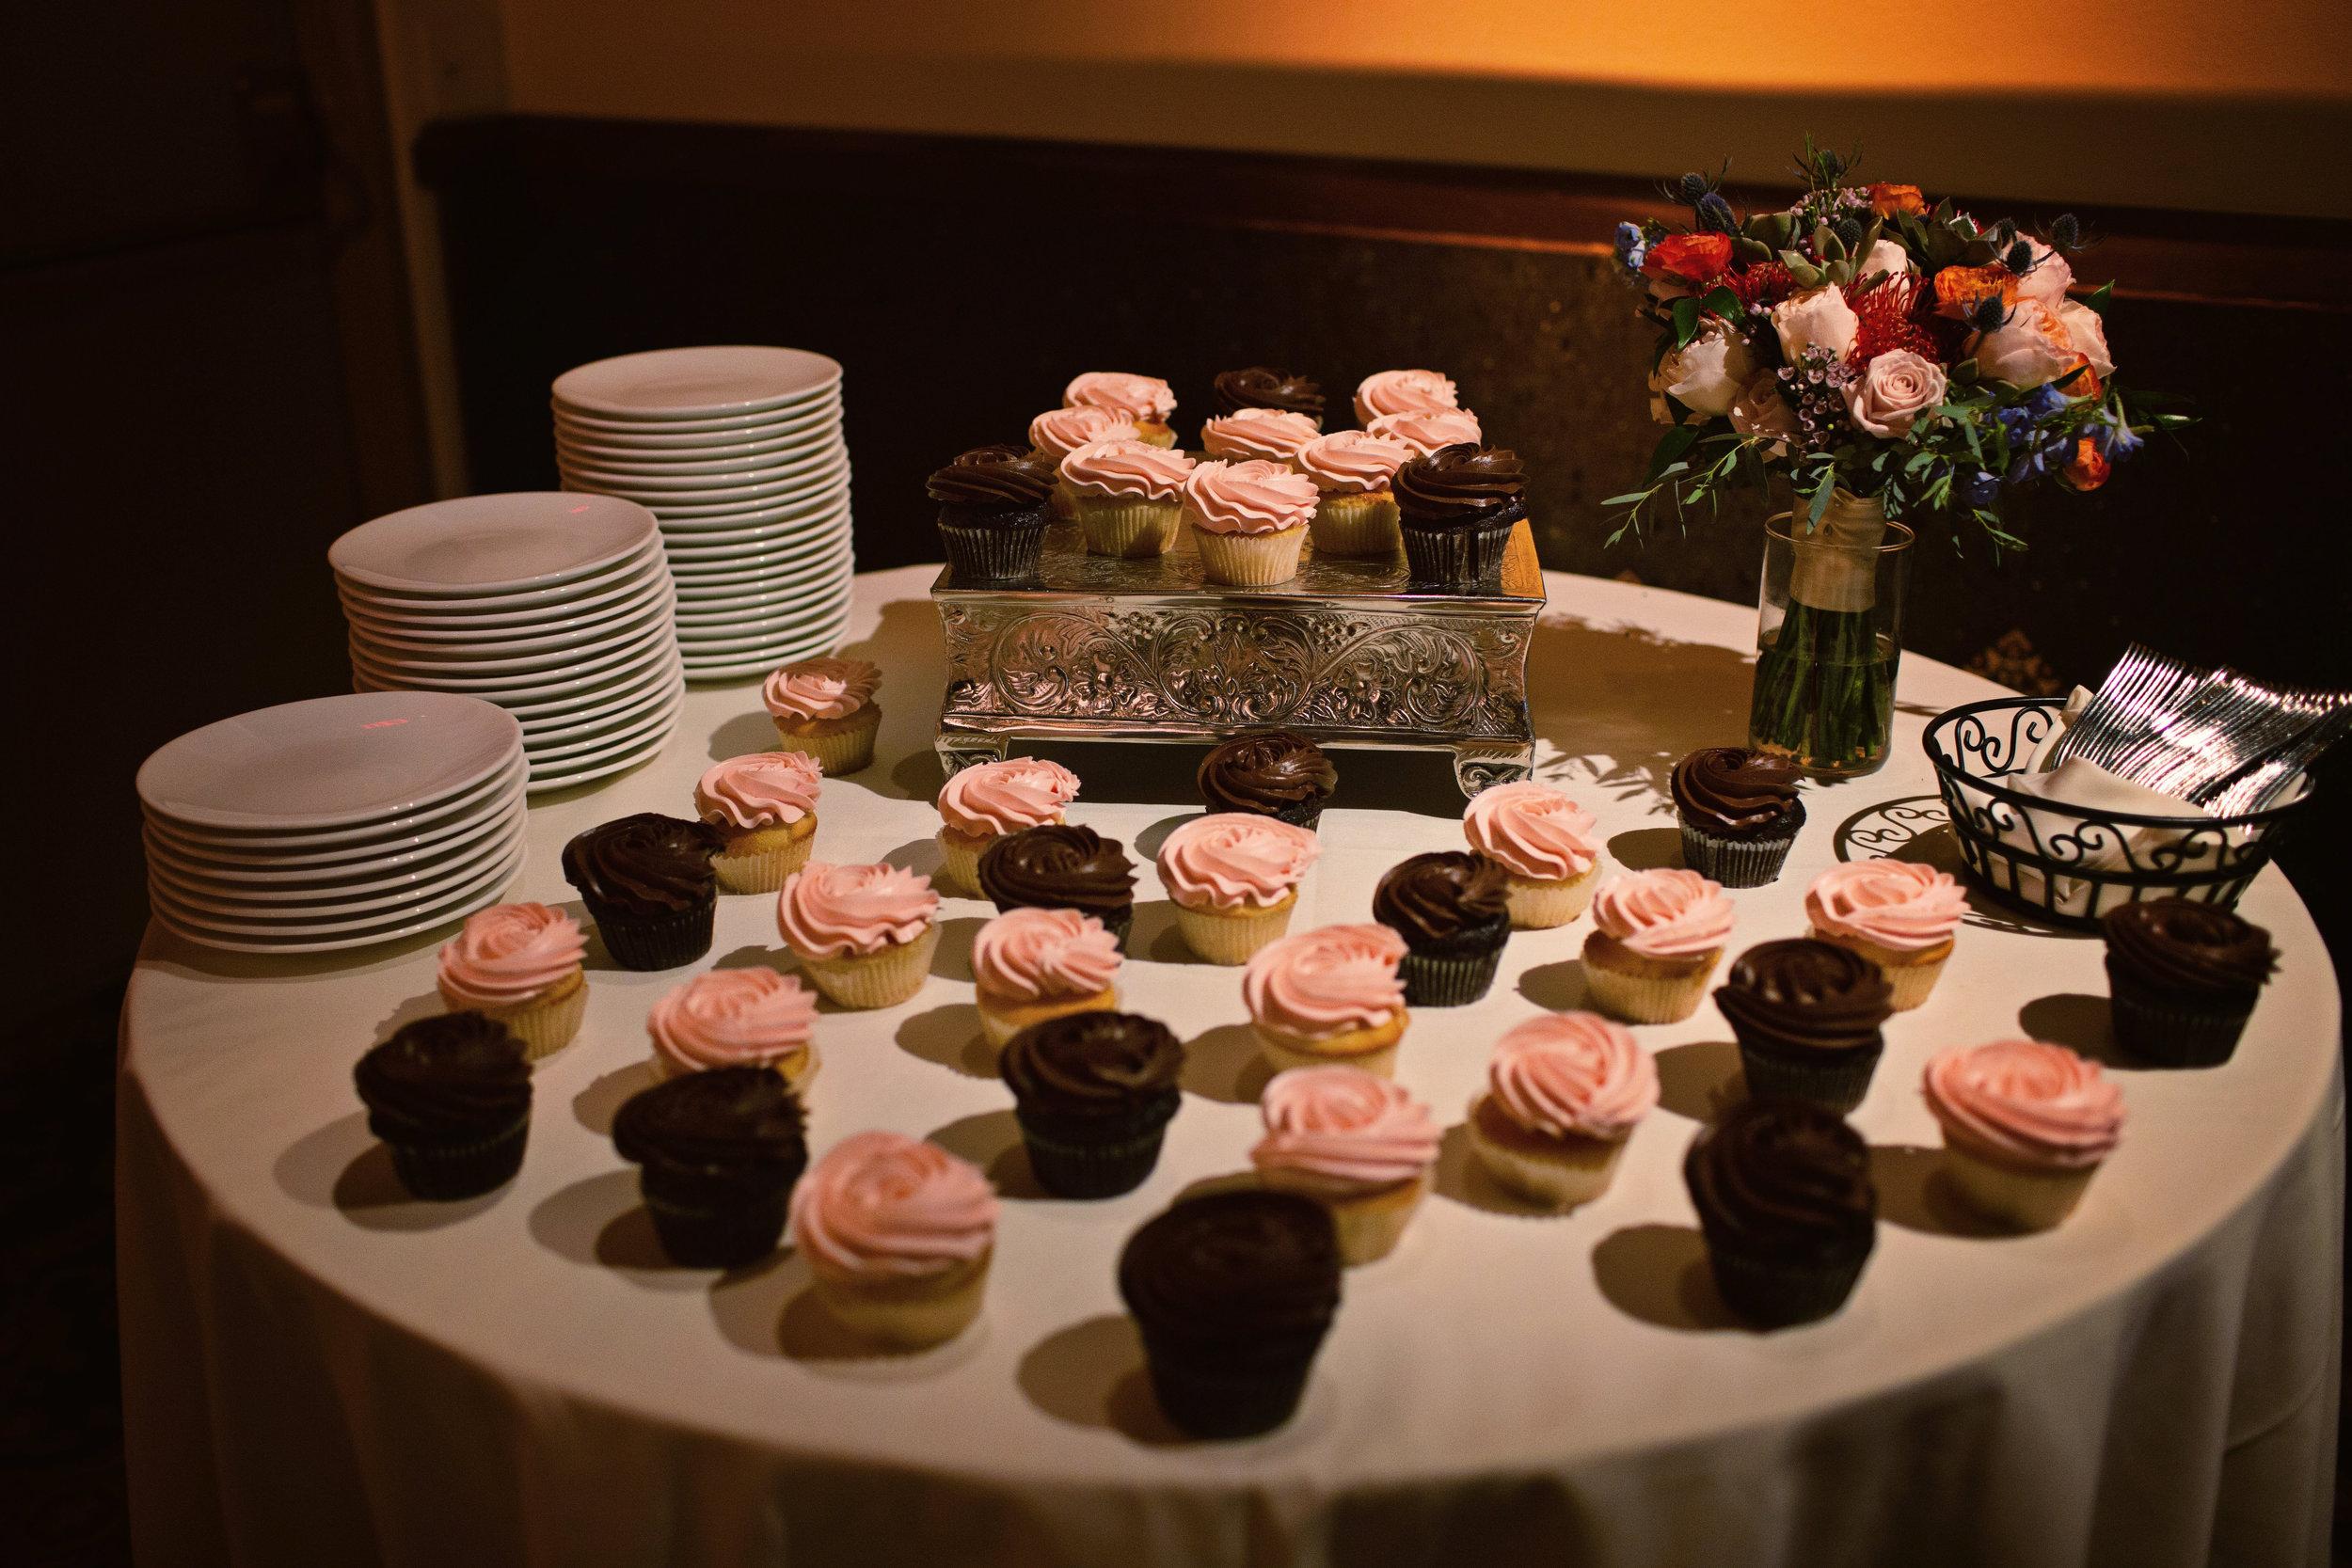 Tucson_Cupcakes.jpg